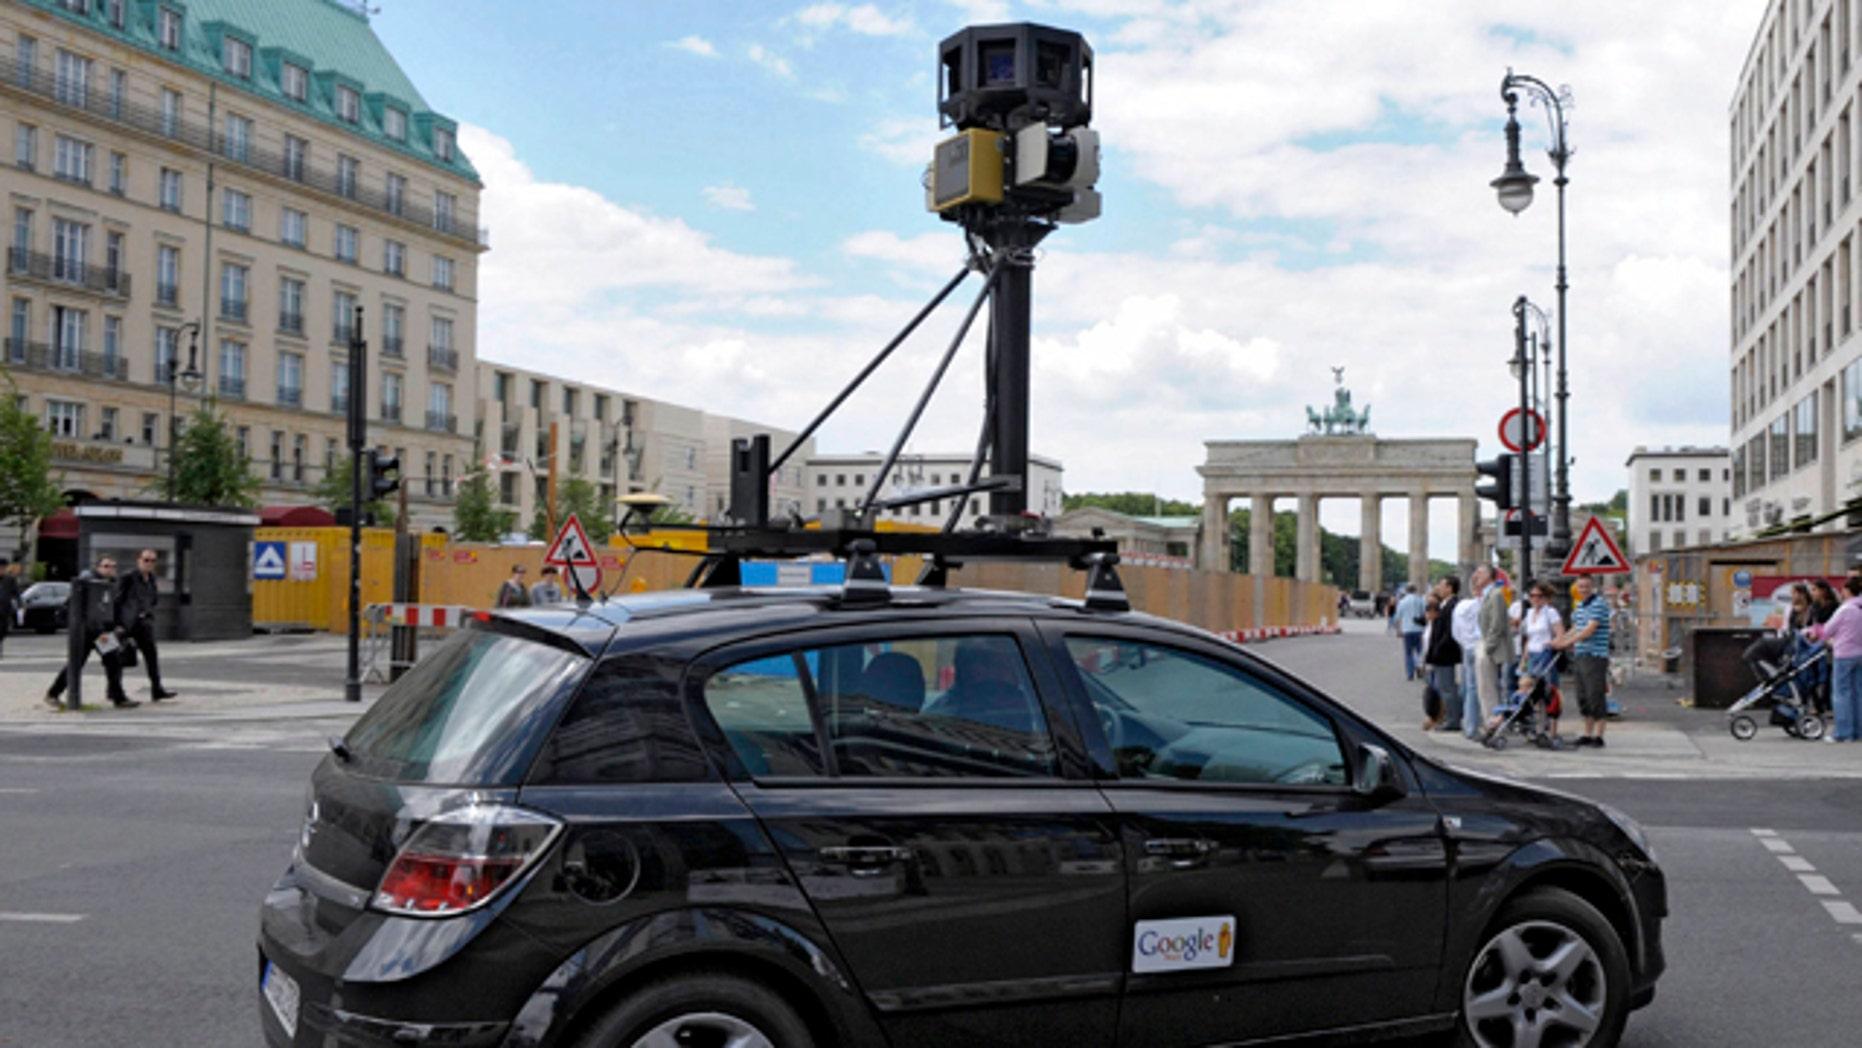 A Google Street View car drives near the Brandenburg Gate in Berlin, Germany.